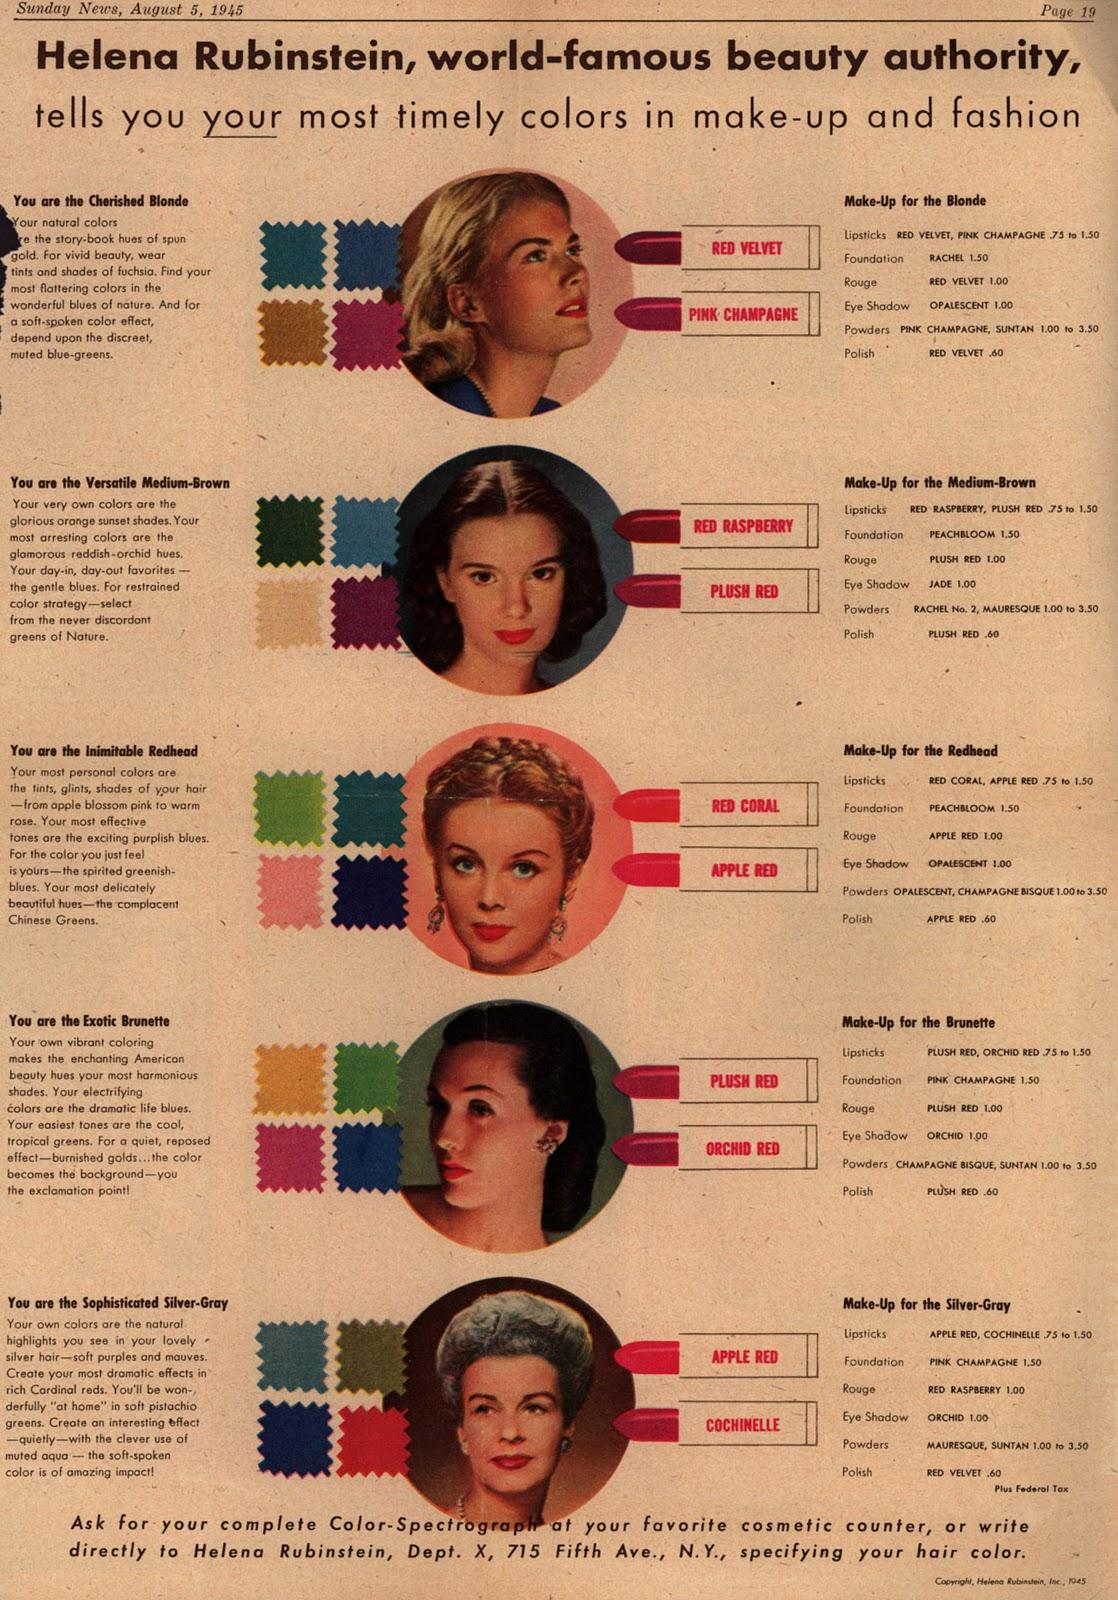 The Helena Rubinstein 1940 S Makeup Guide Glamour Daze